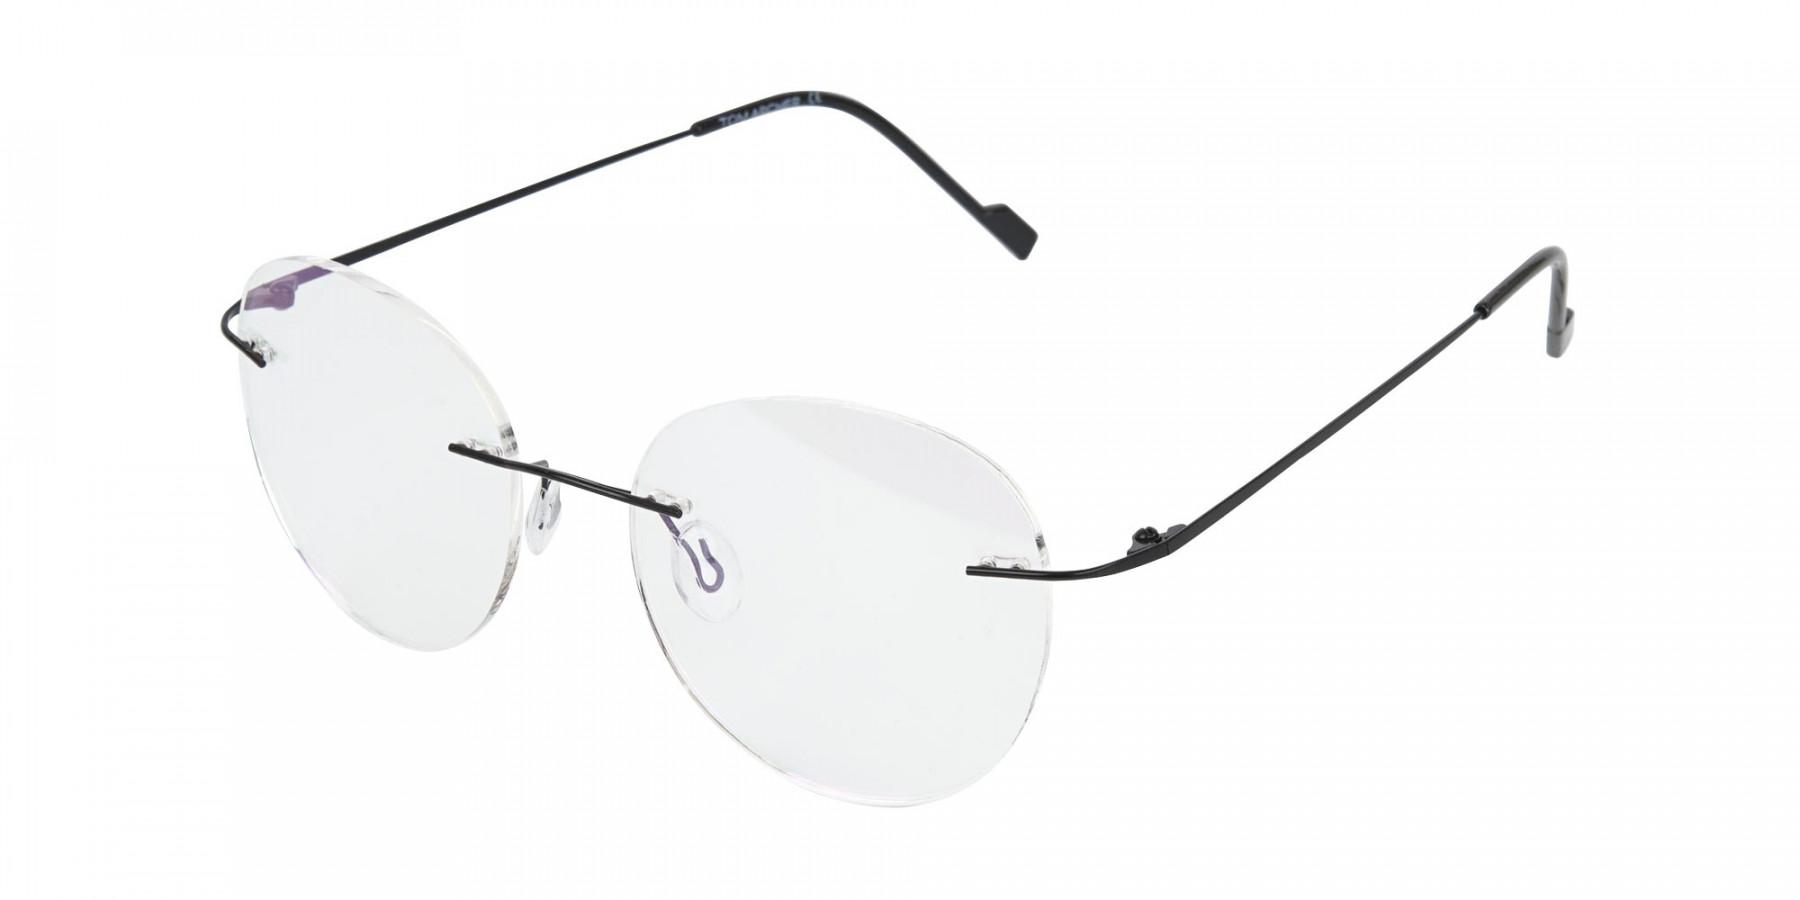 Black Rimless Round Glasses-1